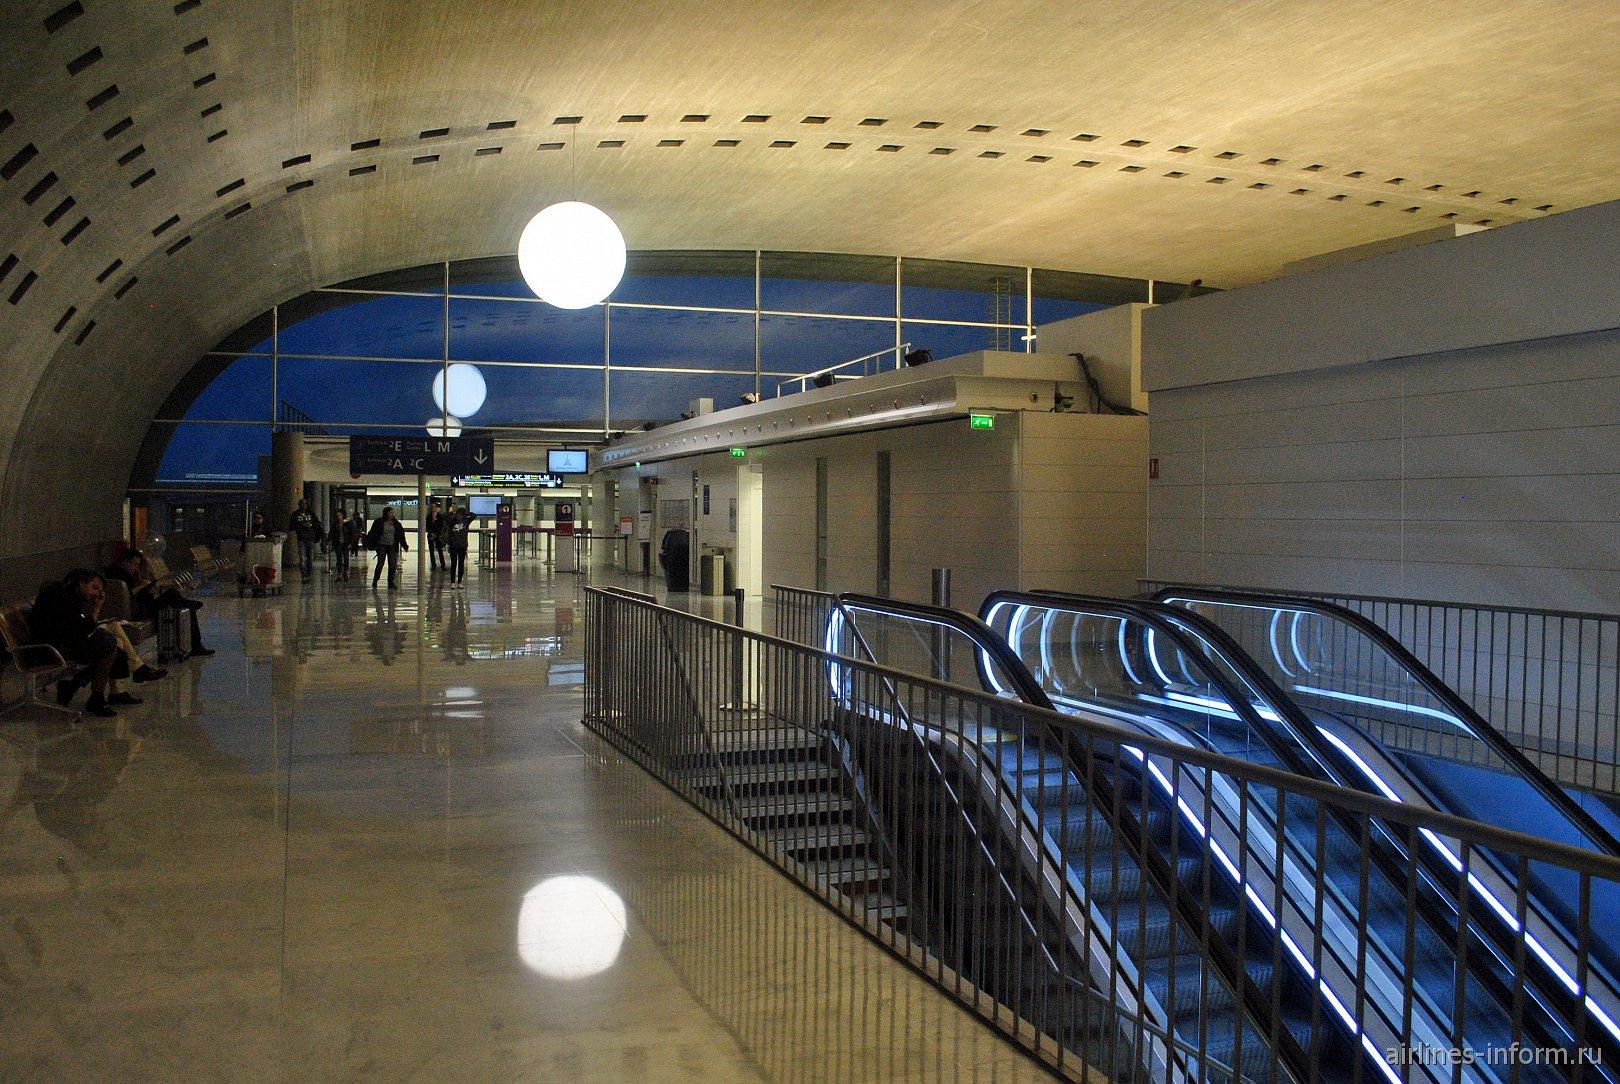 Торец  центральной части конкорса 2F аэропорта Париж Шарль-де-Голль